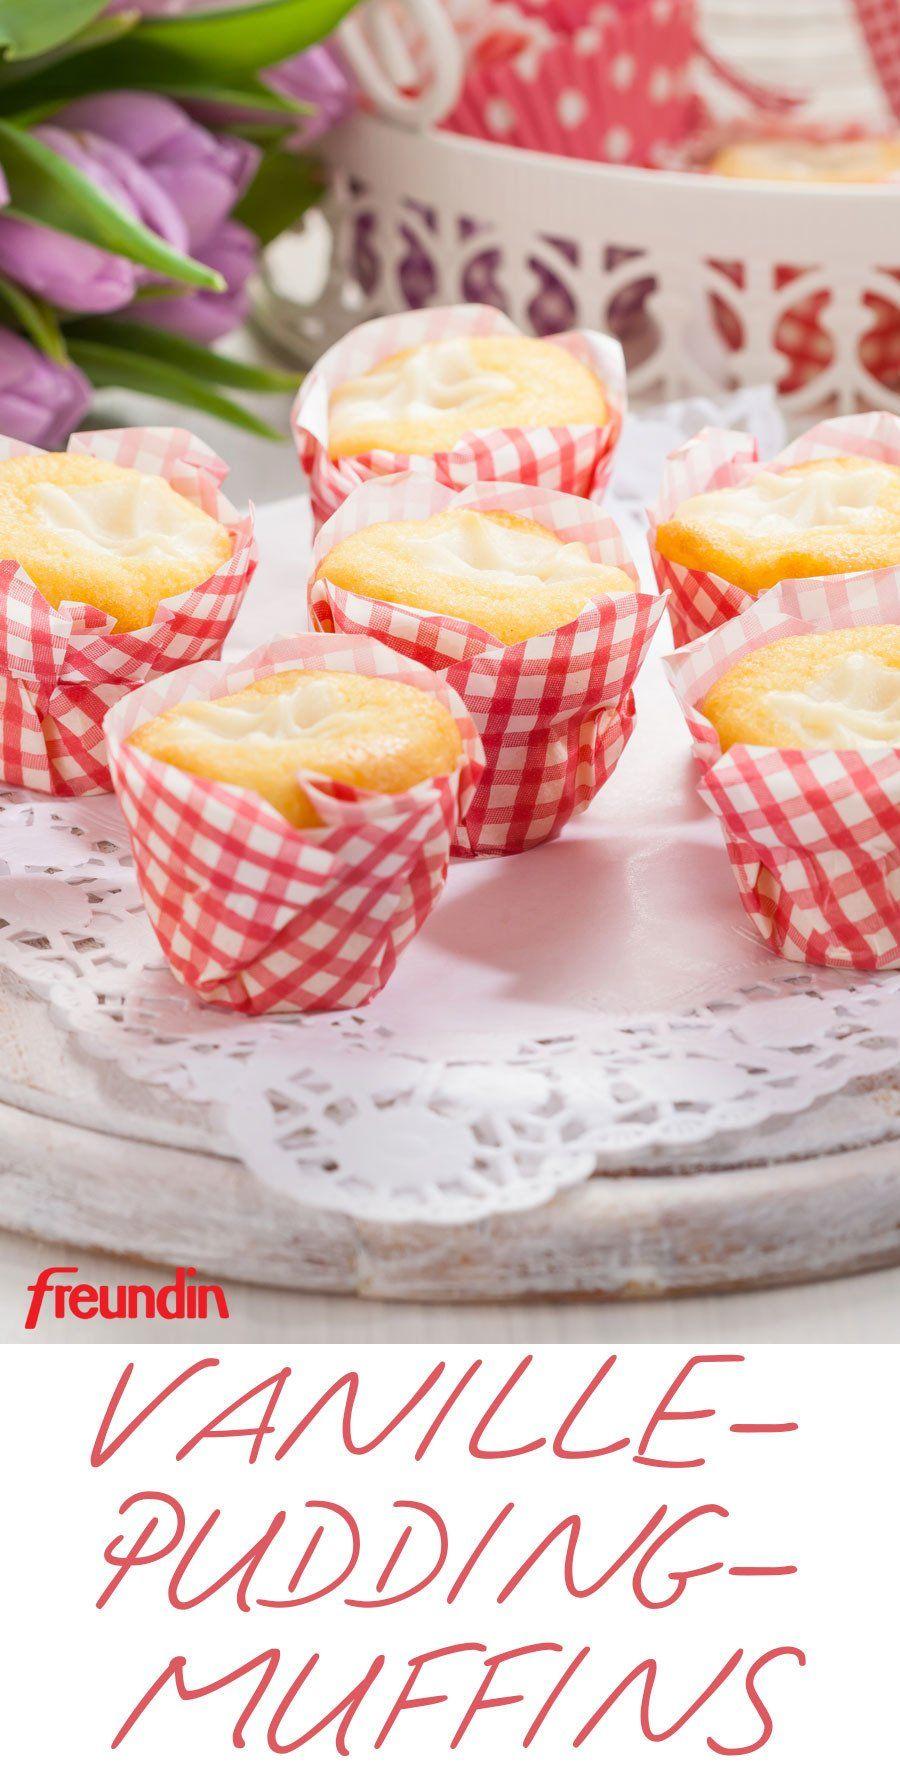 Wochenend-Rezept: Muffins mit Vanillepudding | freundin.de